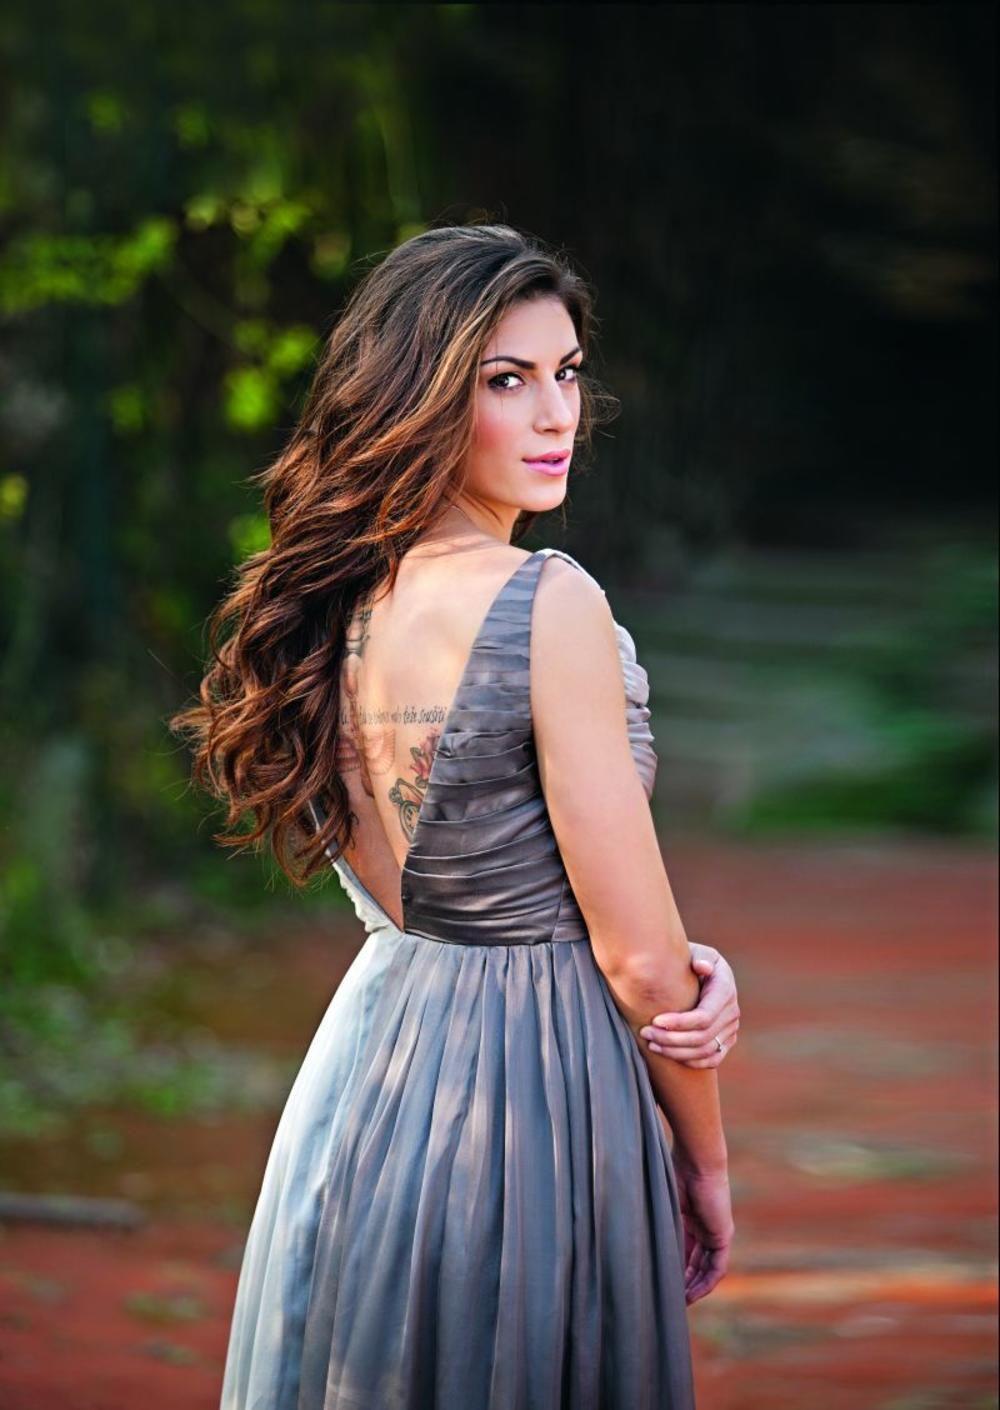 Ivana Spanovic | Backless dress formal, Backless dress